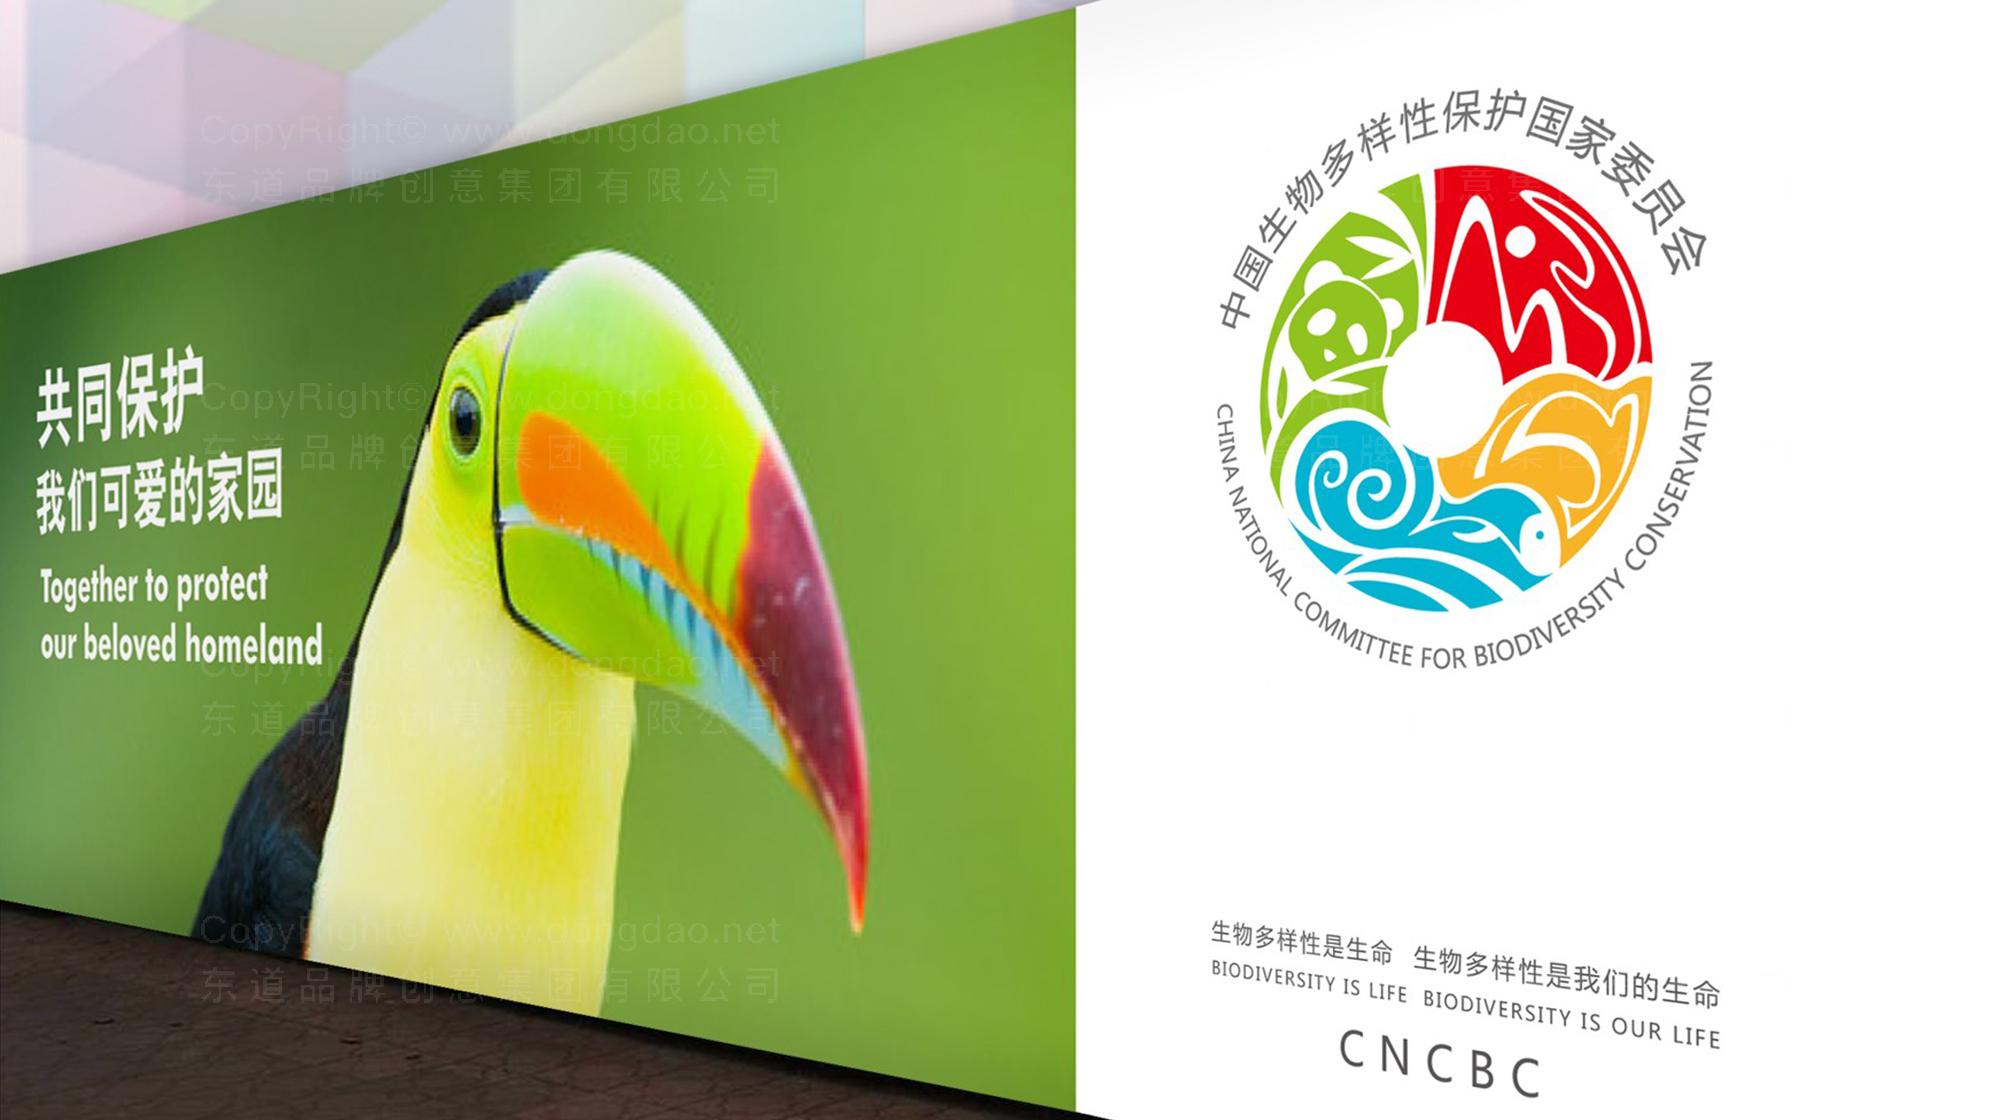 logo设计服务,为中国生物多样性保护国家委员会树立品牌形象